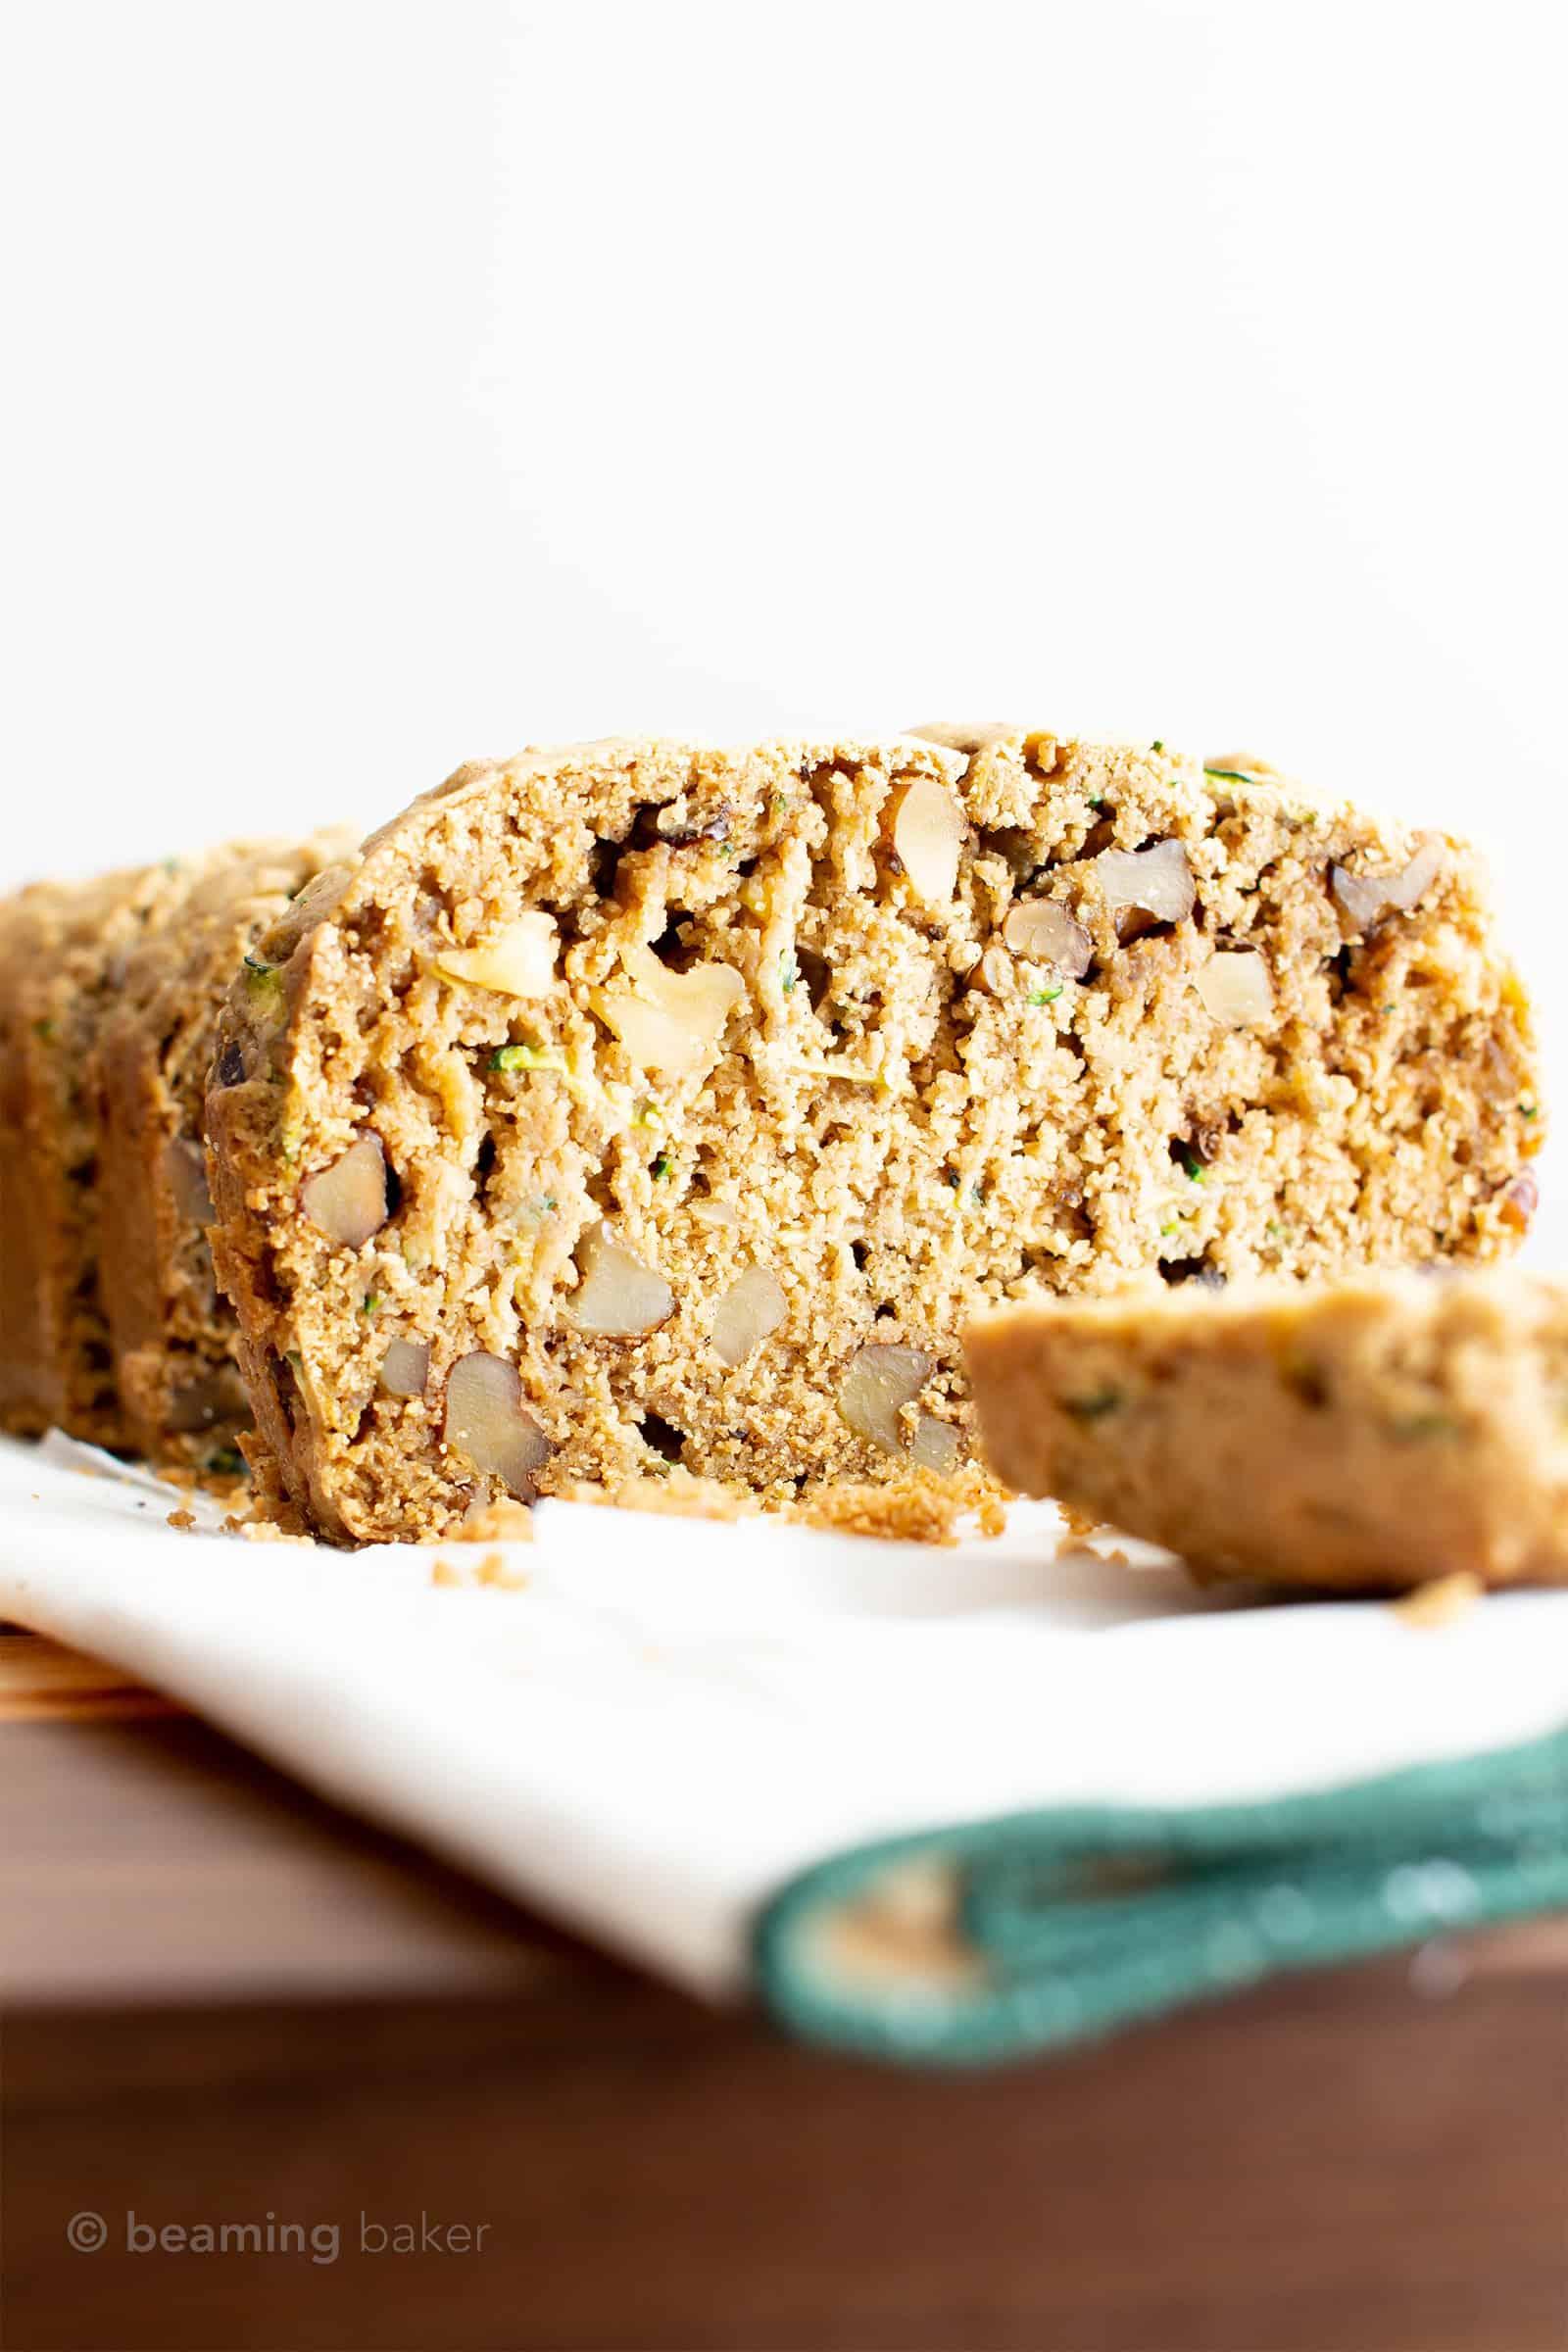 Irresistibly Moist Vegan Gluten Free Zucchini Bread Recipe (GF): this irresistible vegan zucchini bread is moist 'n buttery. The best vegan gluten free zucchini bread—easy recipe, perfect for summer! GF. #Vegan #GlutenFree #Zucchini #Bread | Recipe at BeamingBaker.com